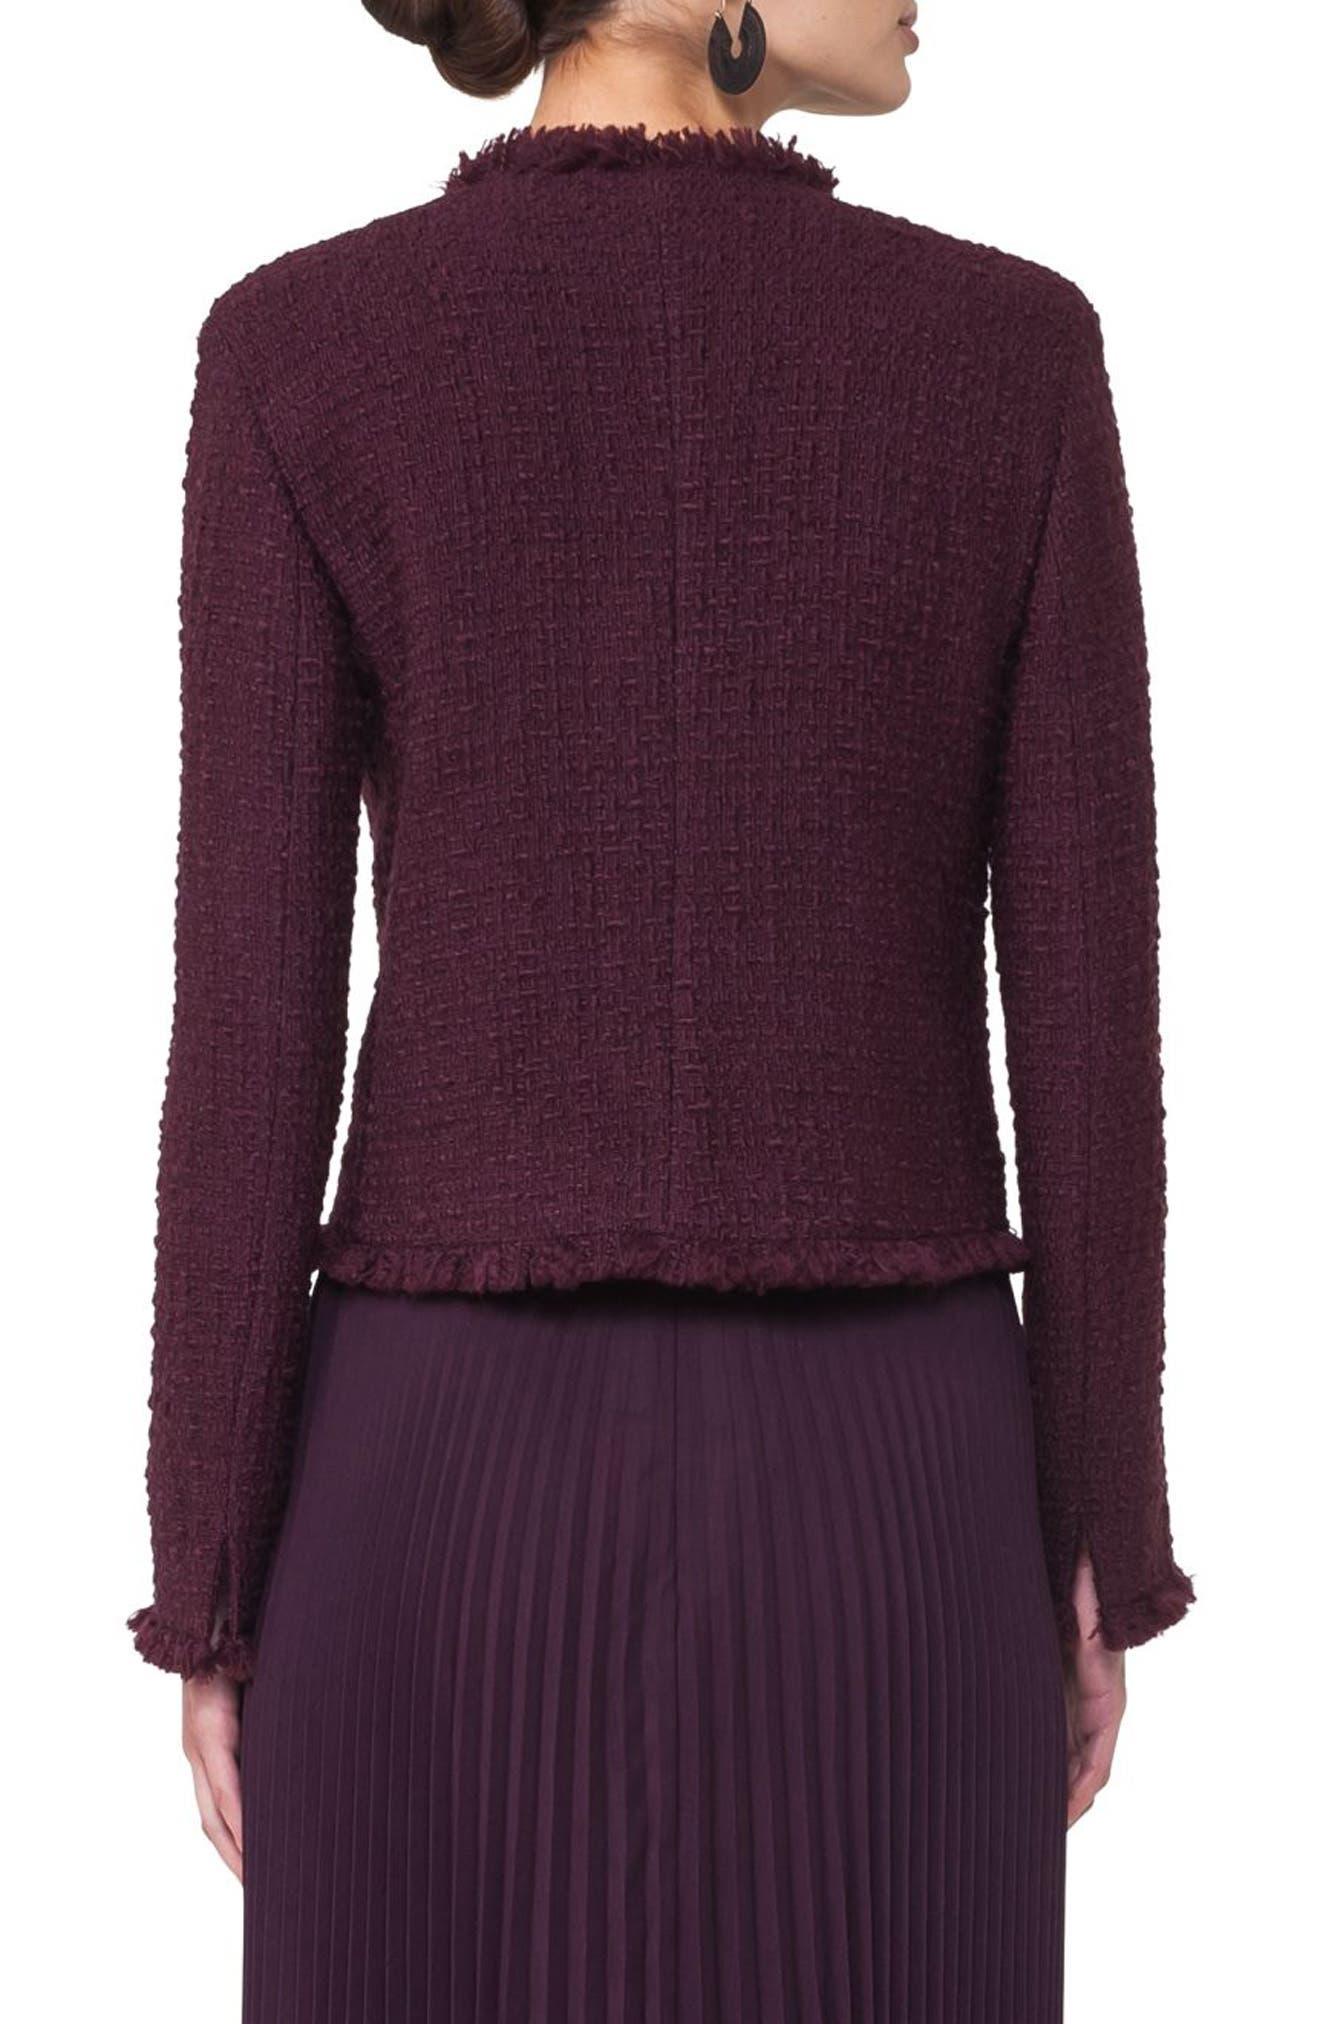 Tweed Jacket,                             Alternate thumbnail 2, color,                             Wine